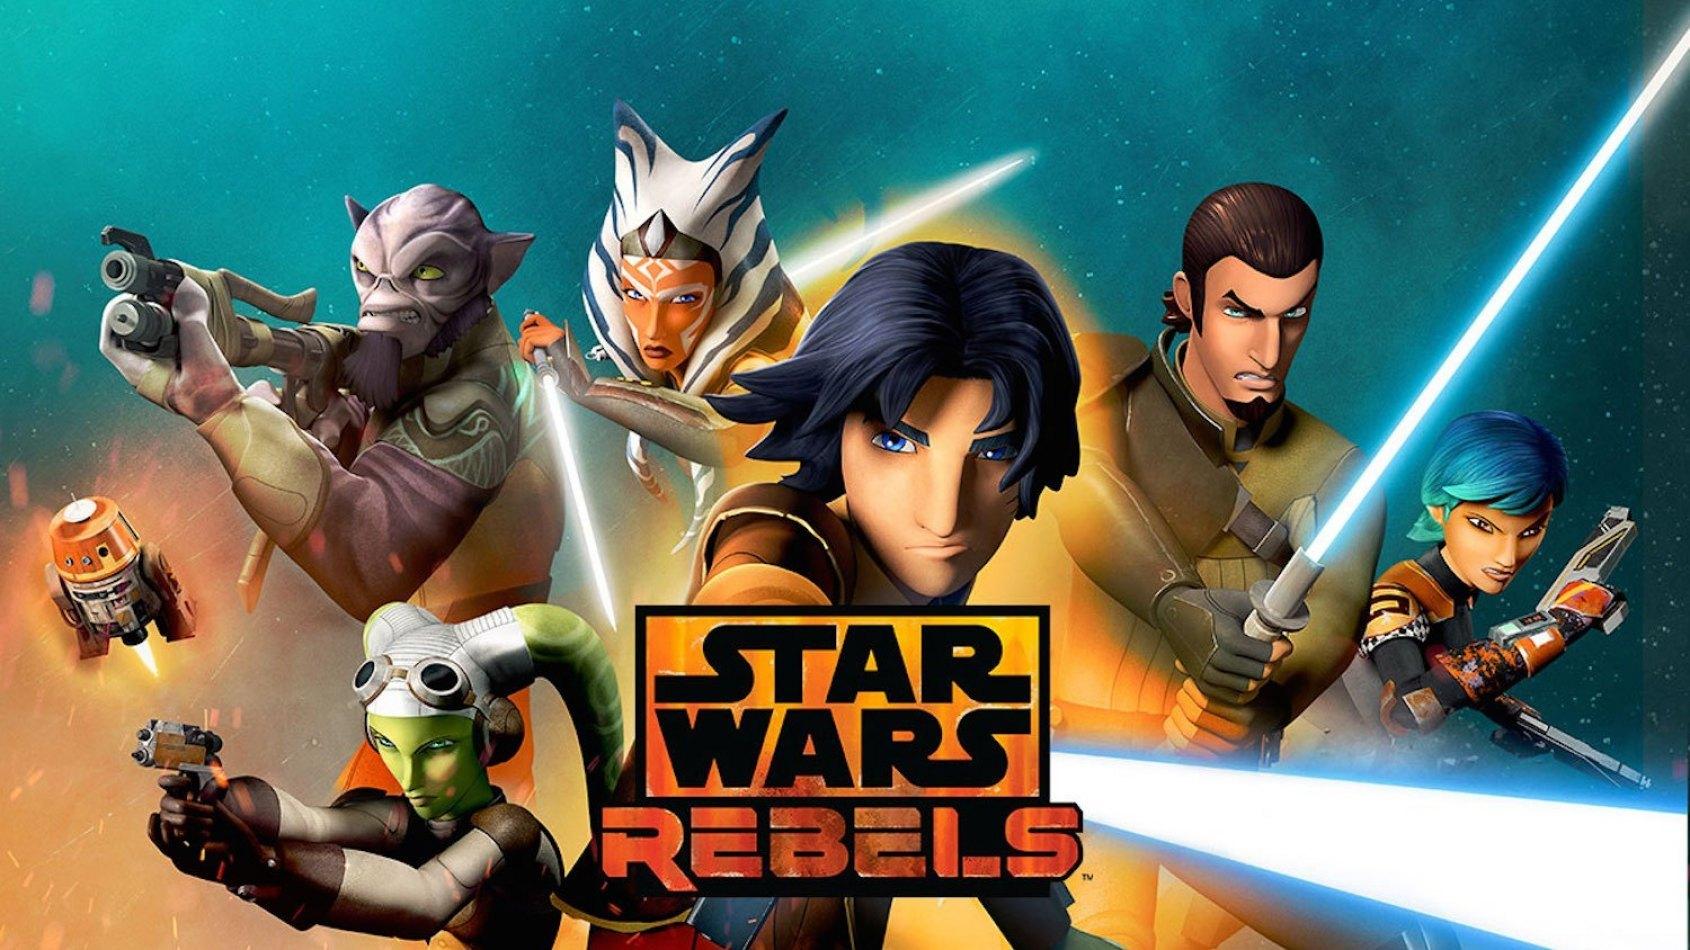 Les 10 meilleurs moments de Star Wars Rebels